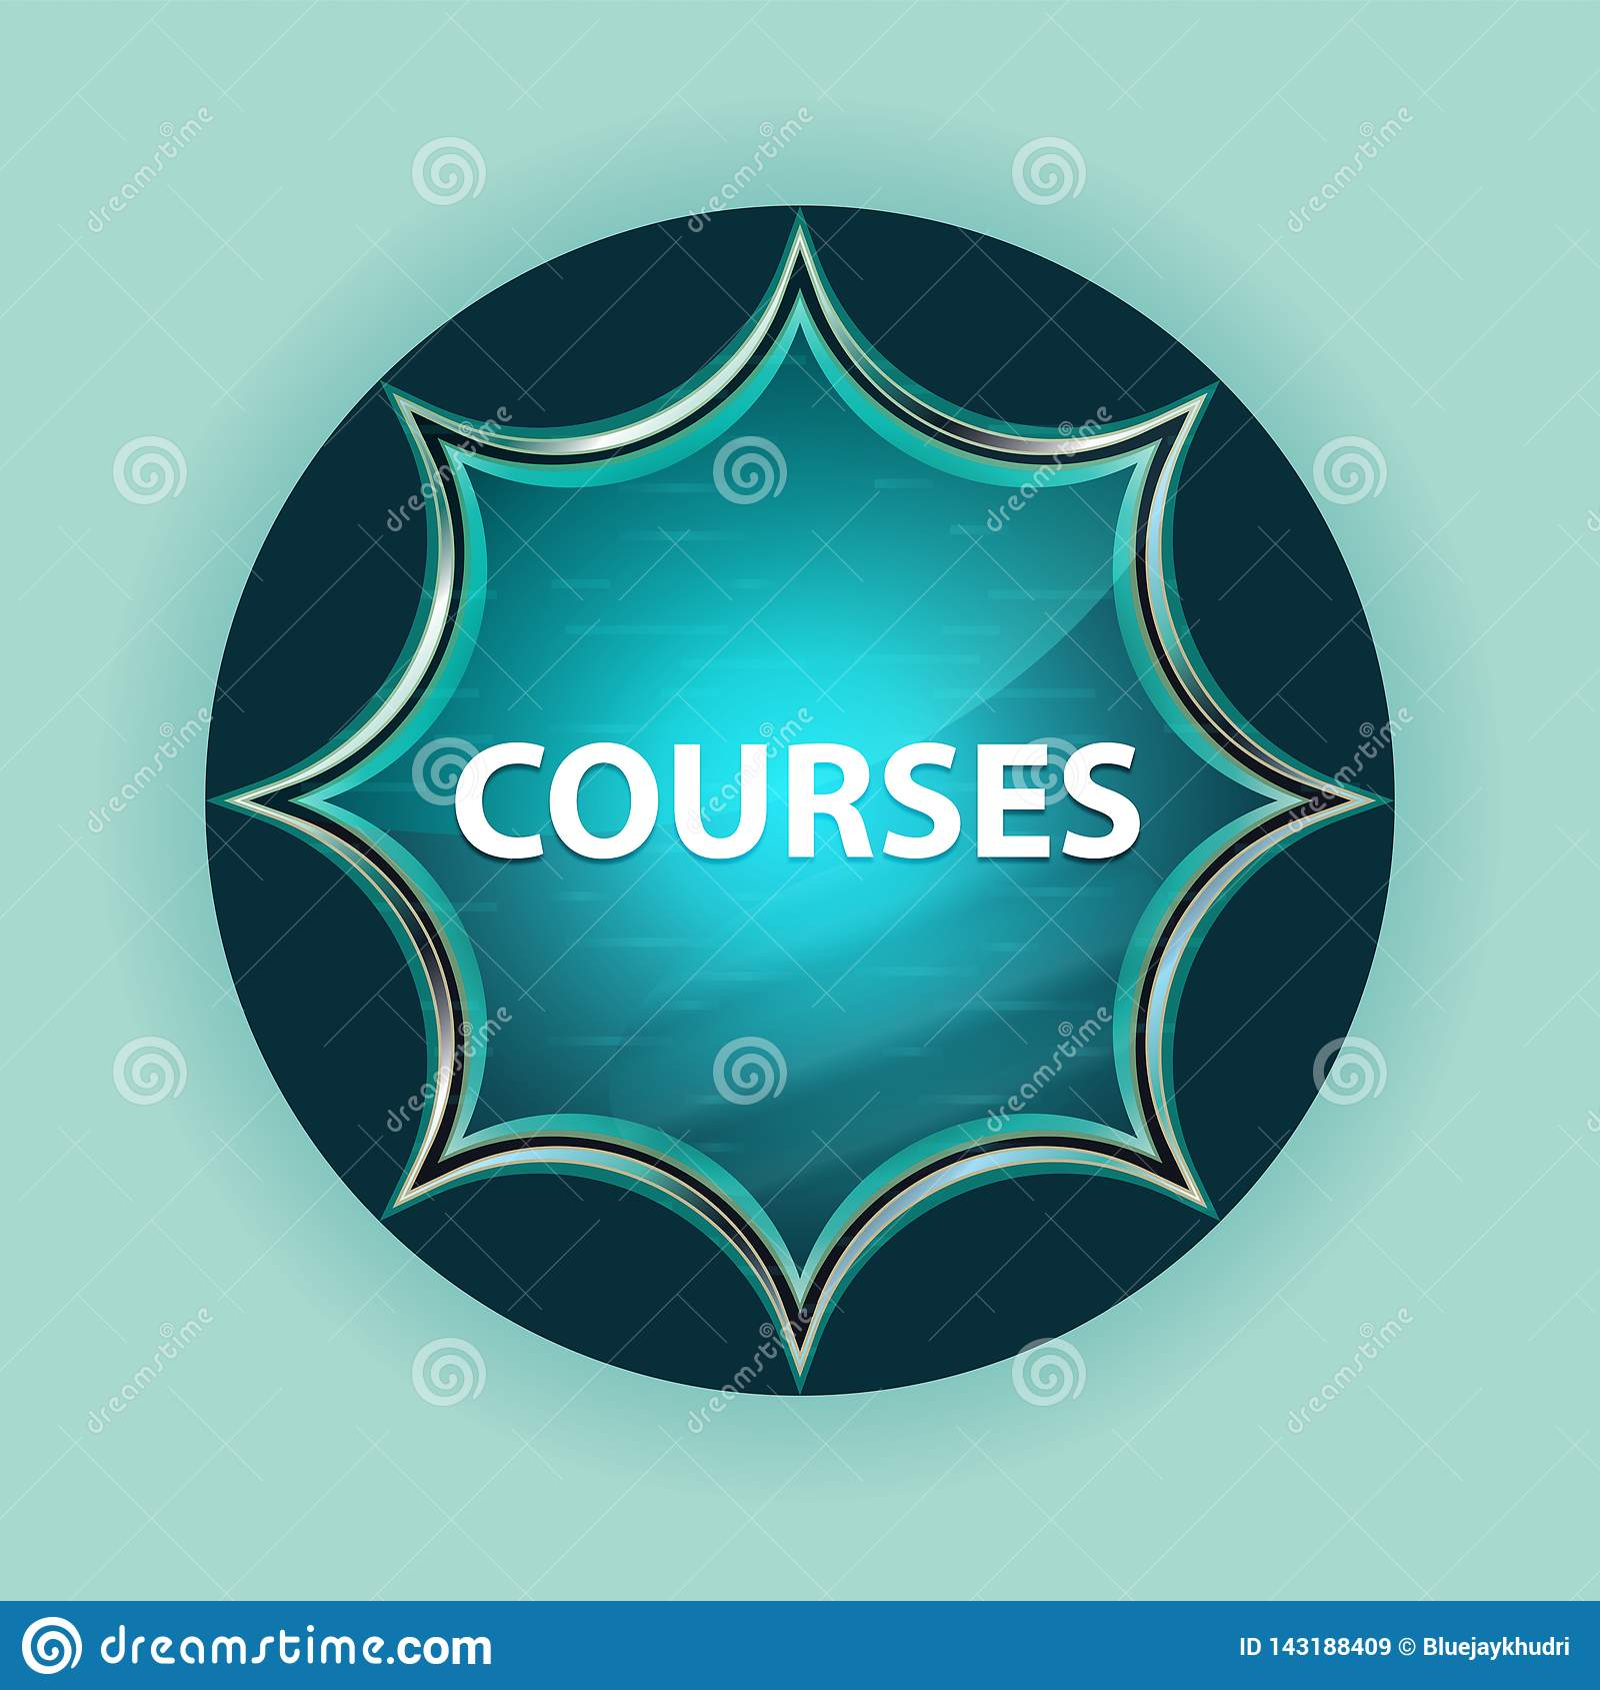 Courses magical glassy sunburst blue button sky blue background